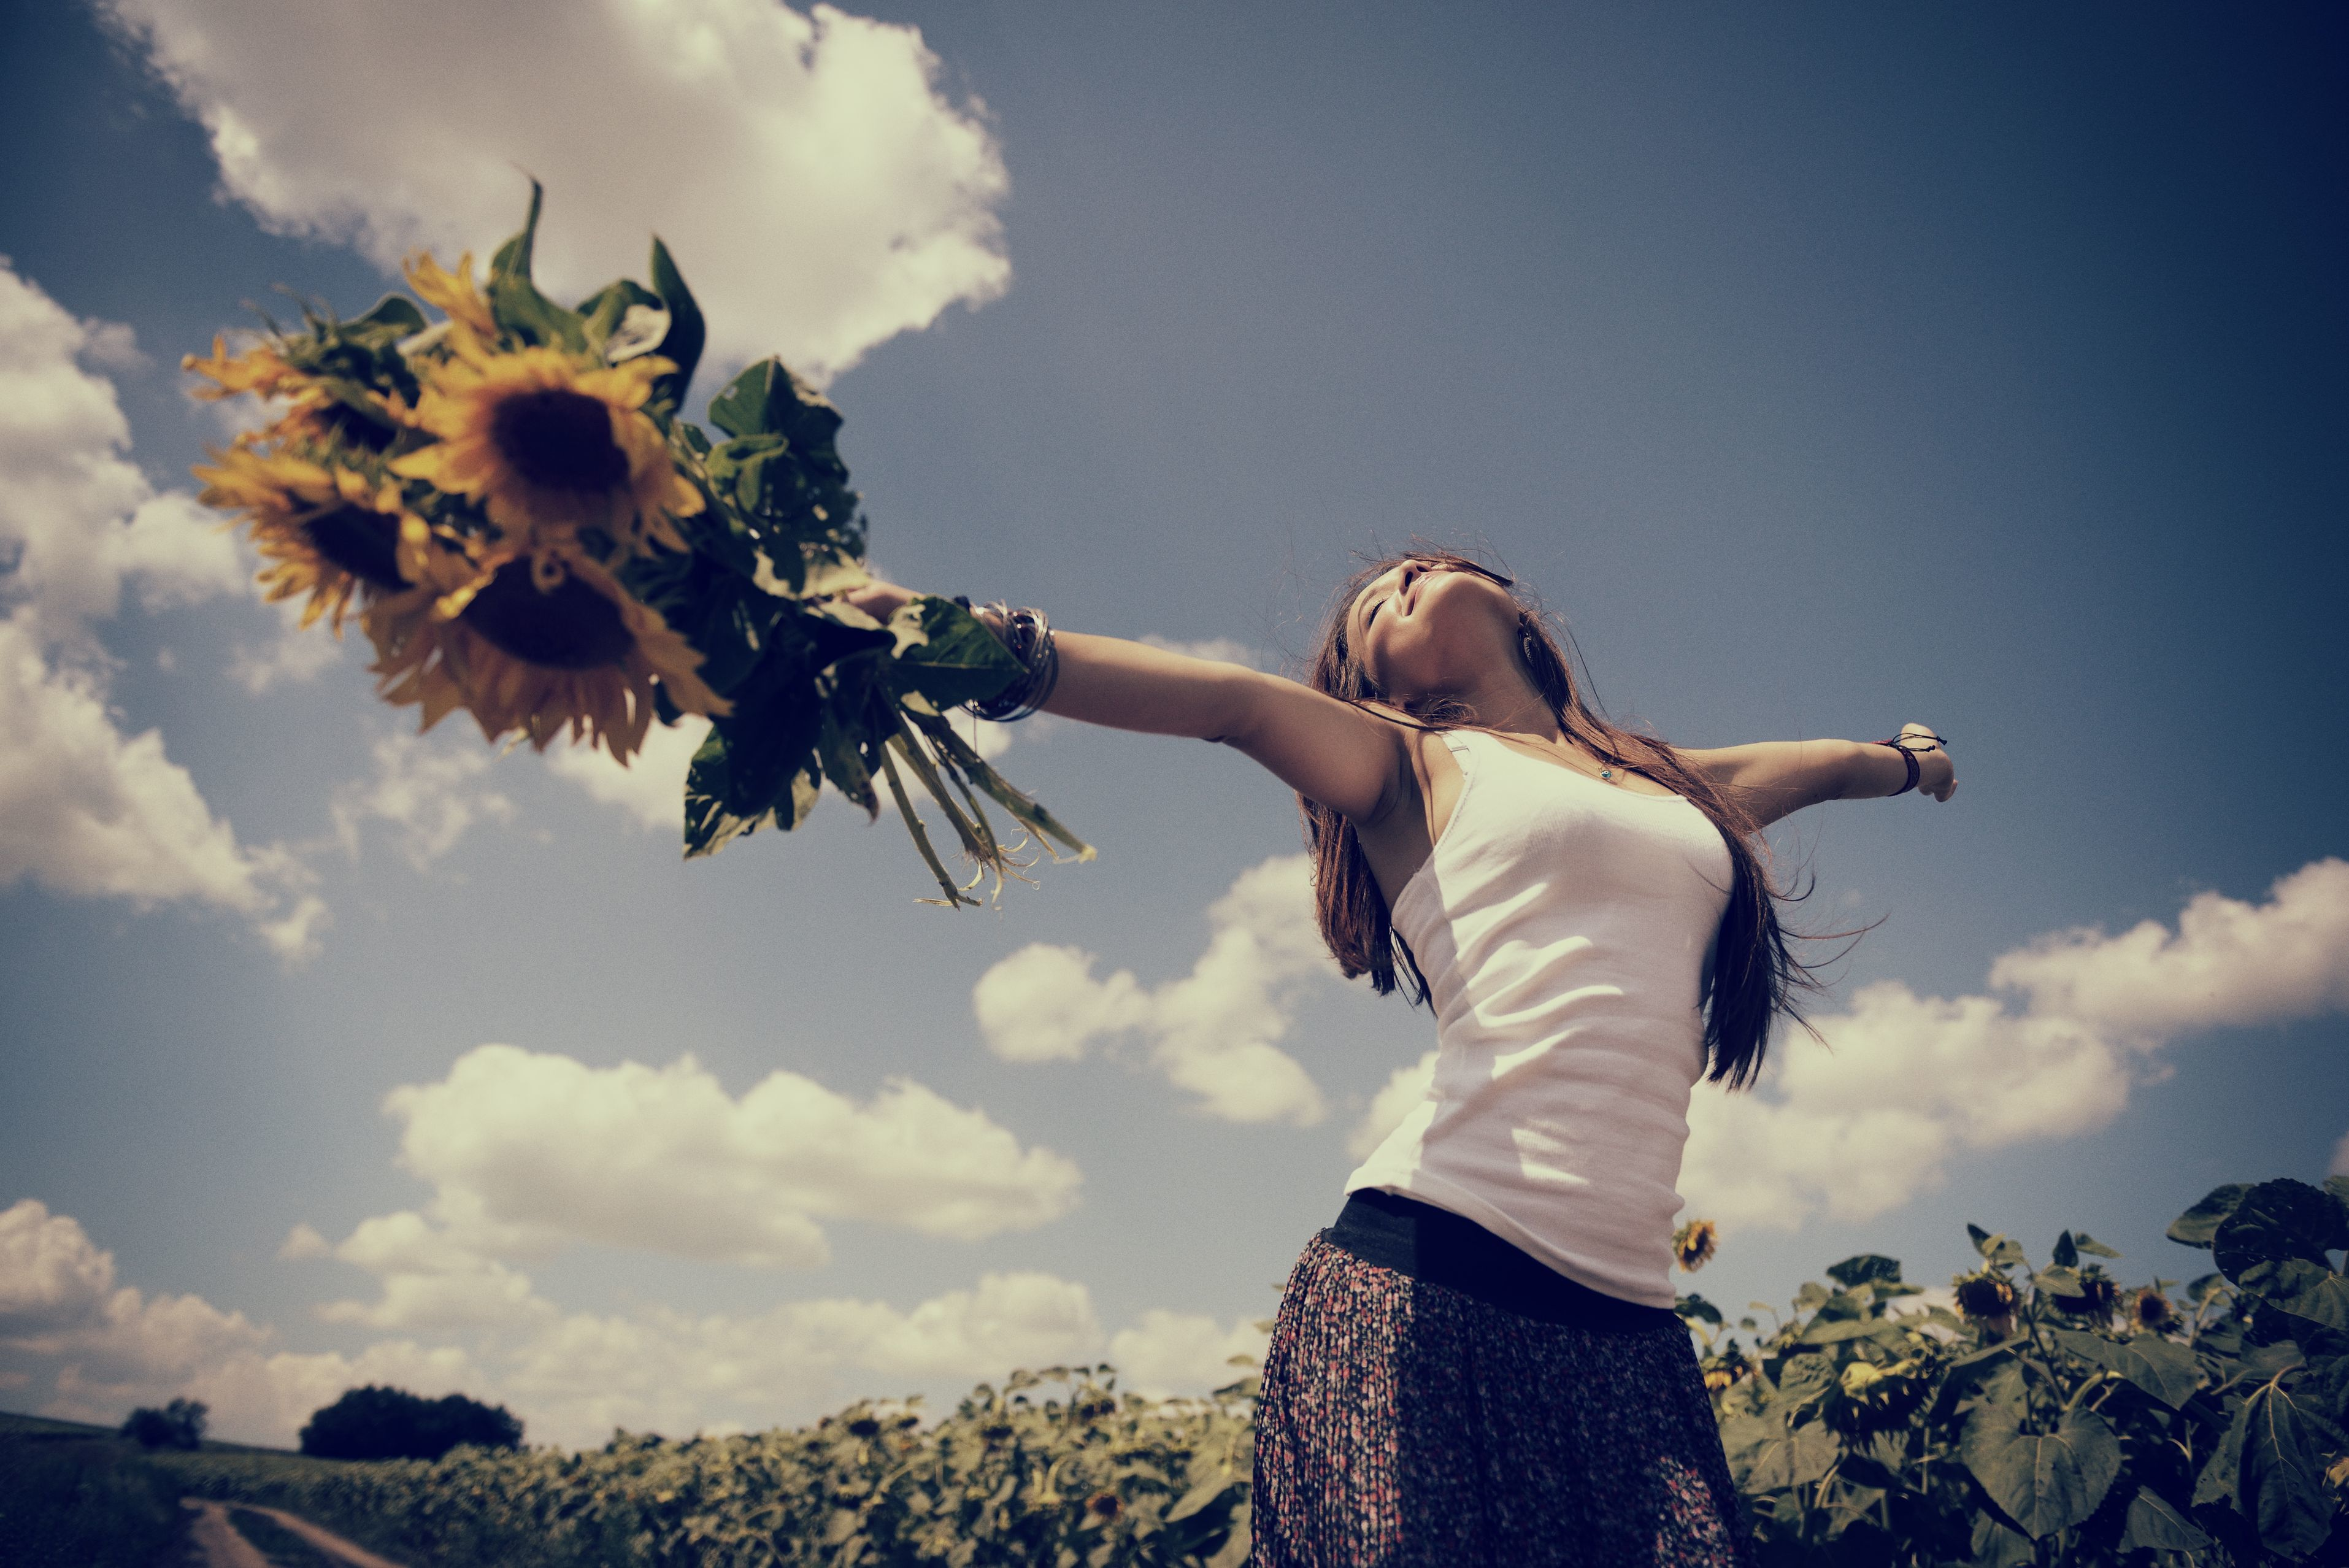 Картинки счастливой девушки на аву, одесса